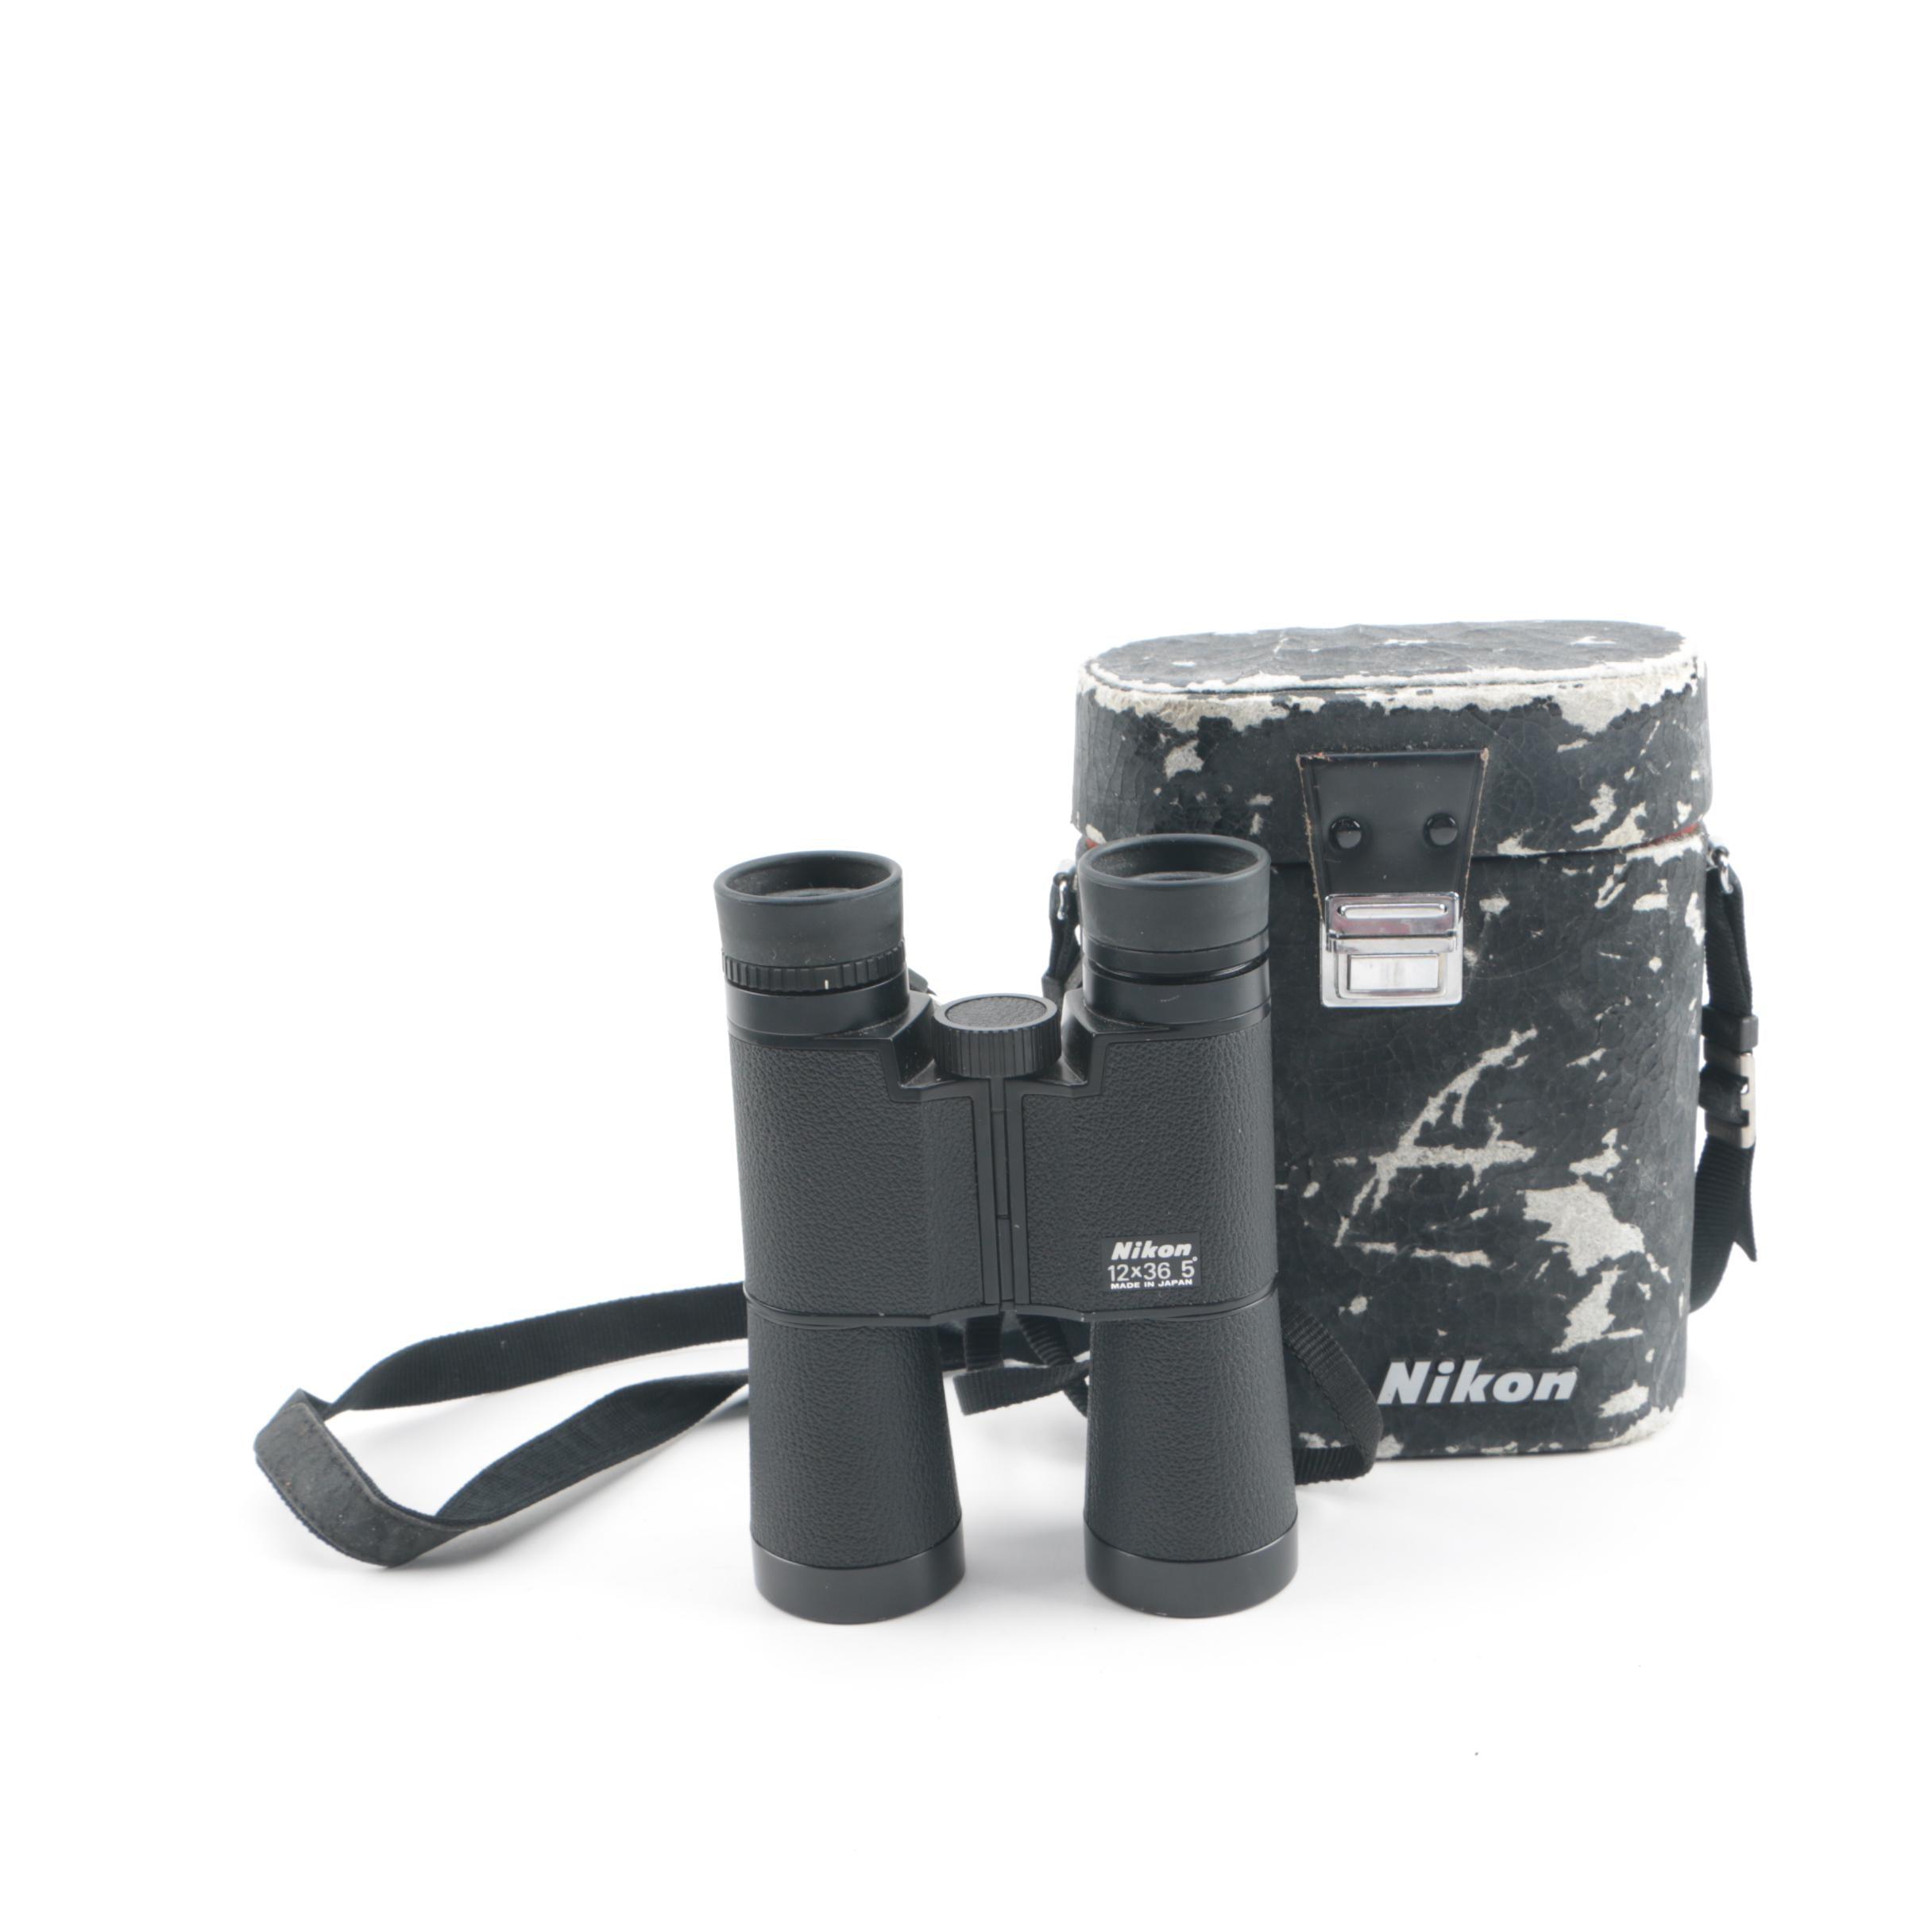 Vintage Nikon Binoculars with Case